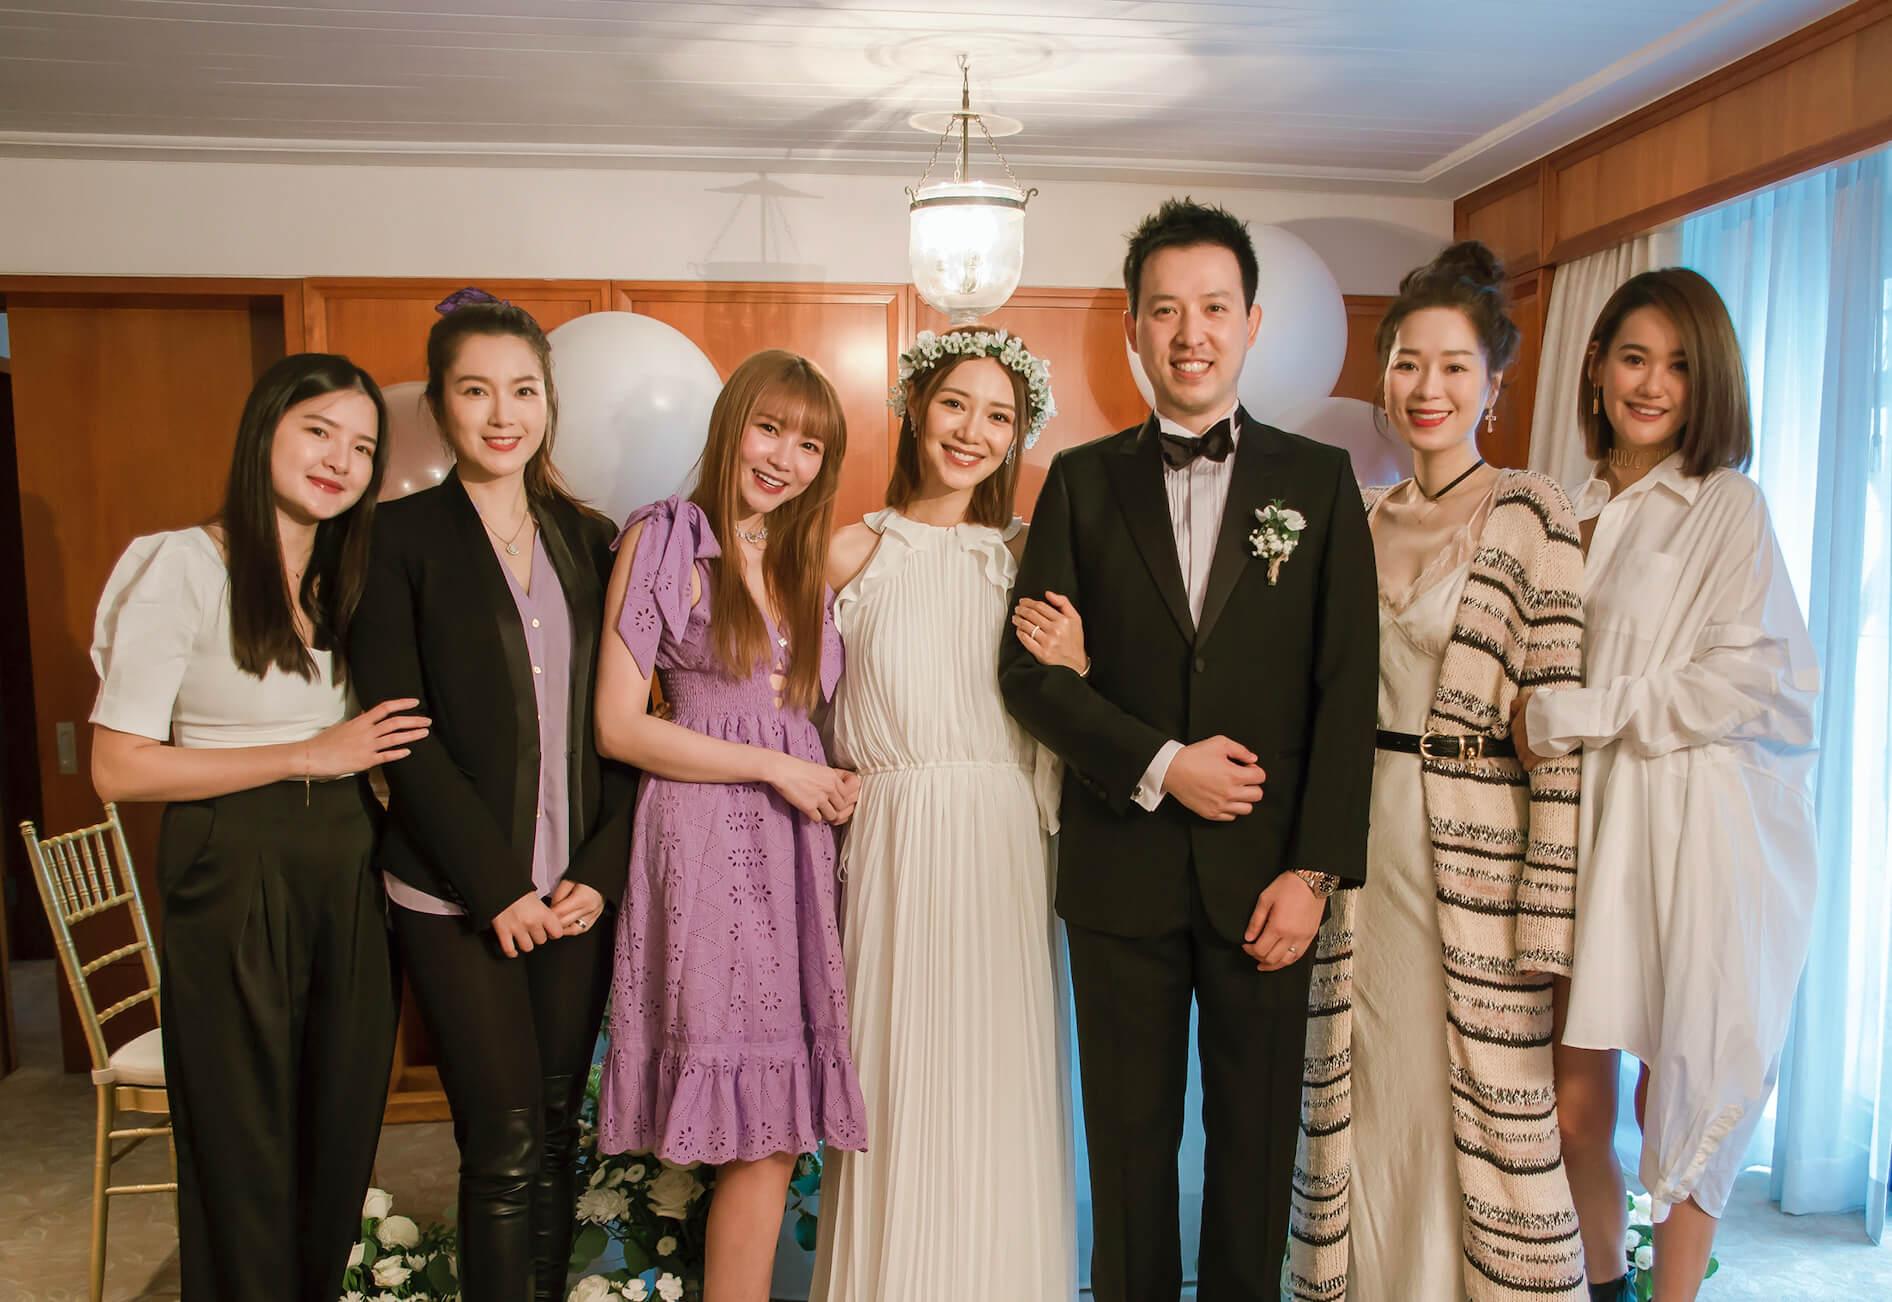 (左起)經理人ula, 苟蕓慧,Lilian kan, elva, V先生,Zelia, angel